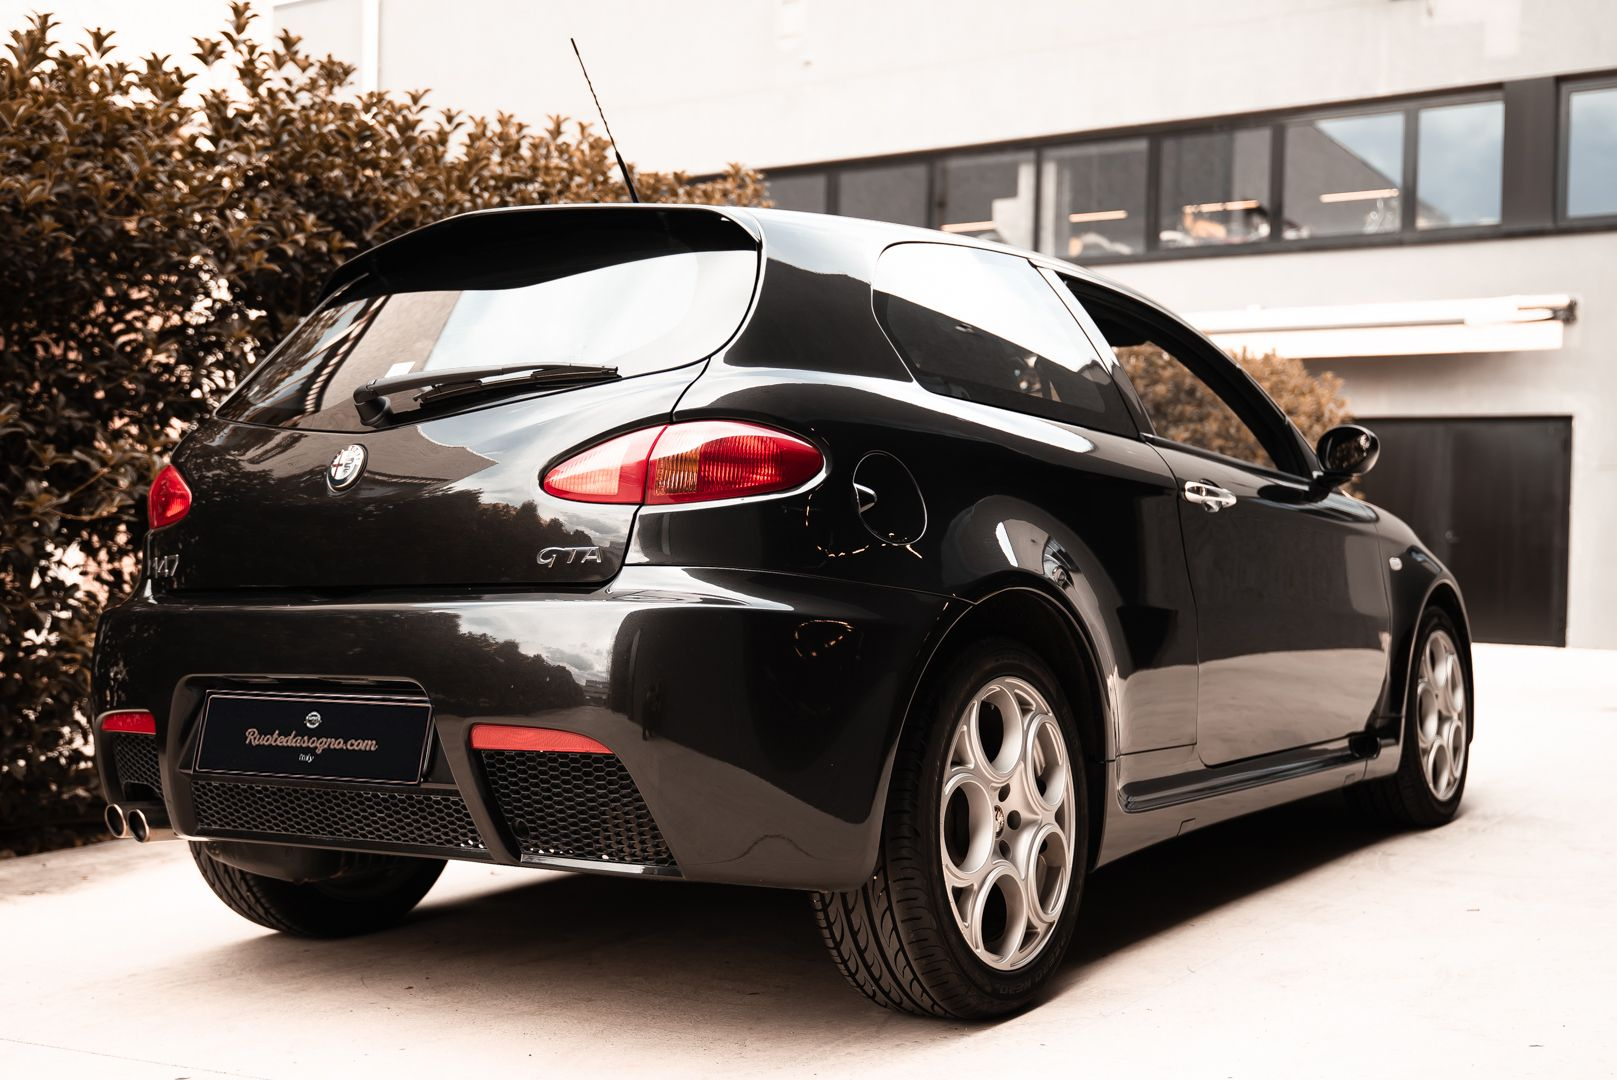 2003 Alfa Romeo 147 GTA 3.2i V6 24V 79567